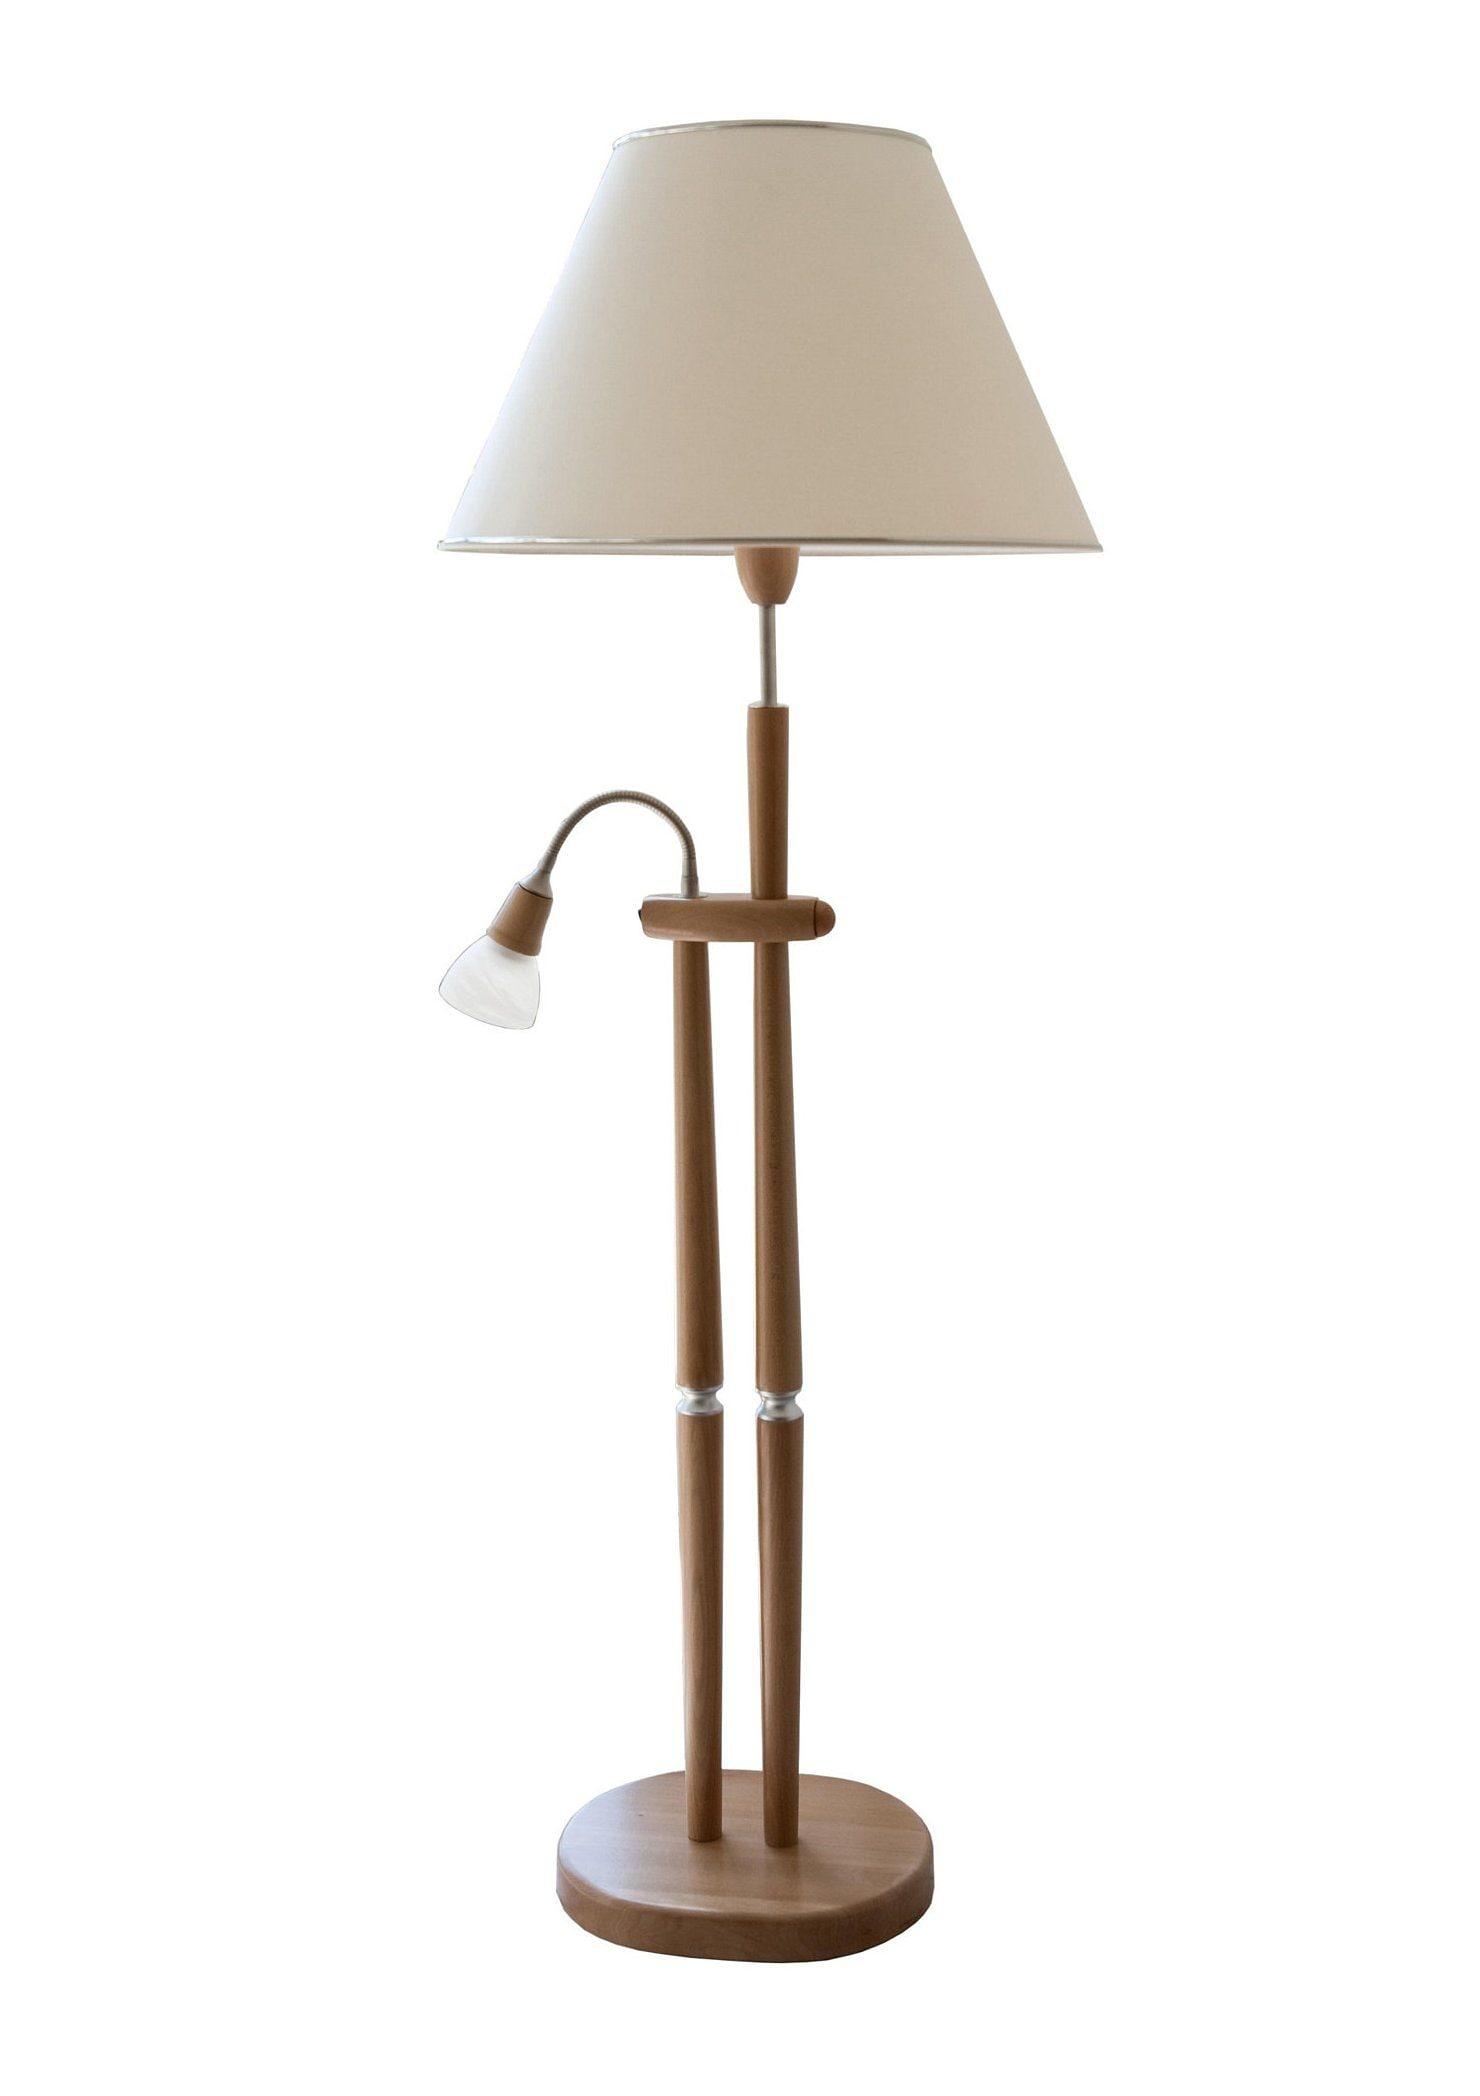 LED Stehlampe8652/S Wohnen/Accessoires & Leuchten/Lampen & Leuchten/Leselampen